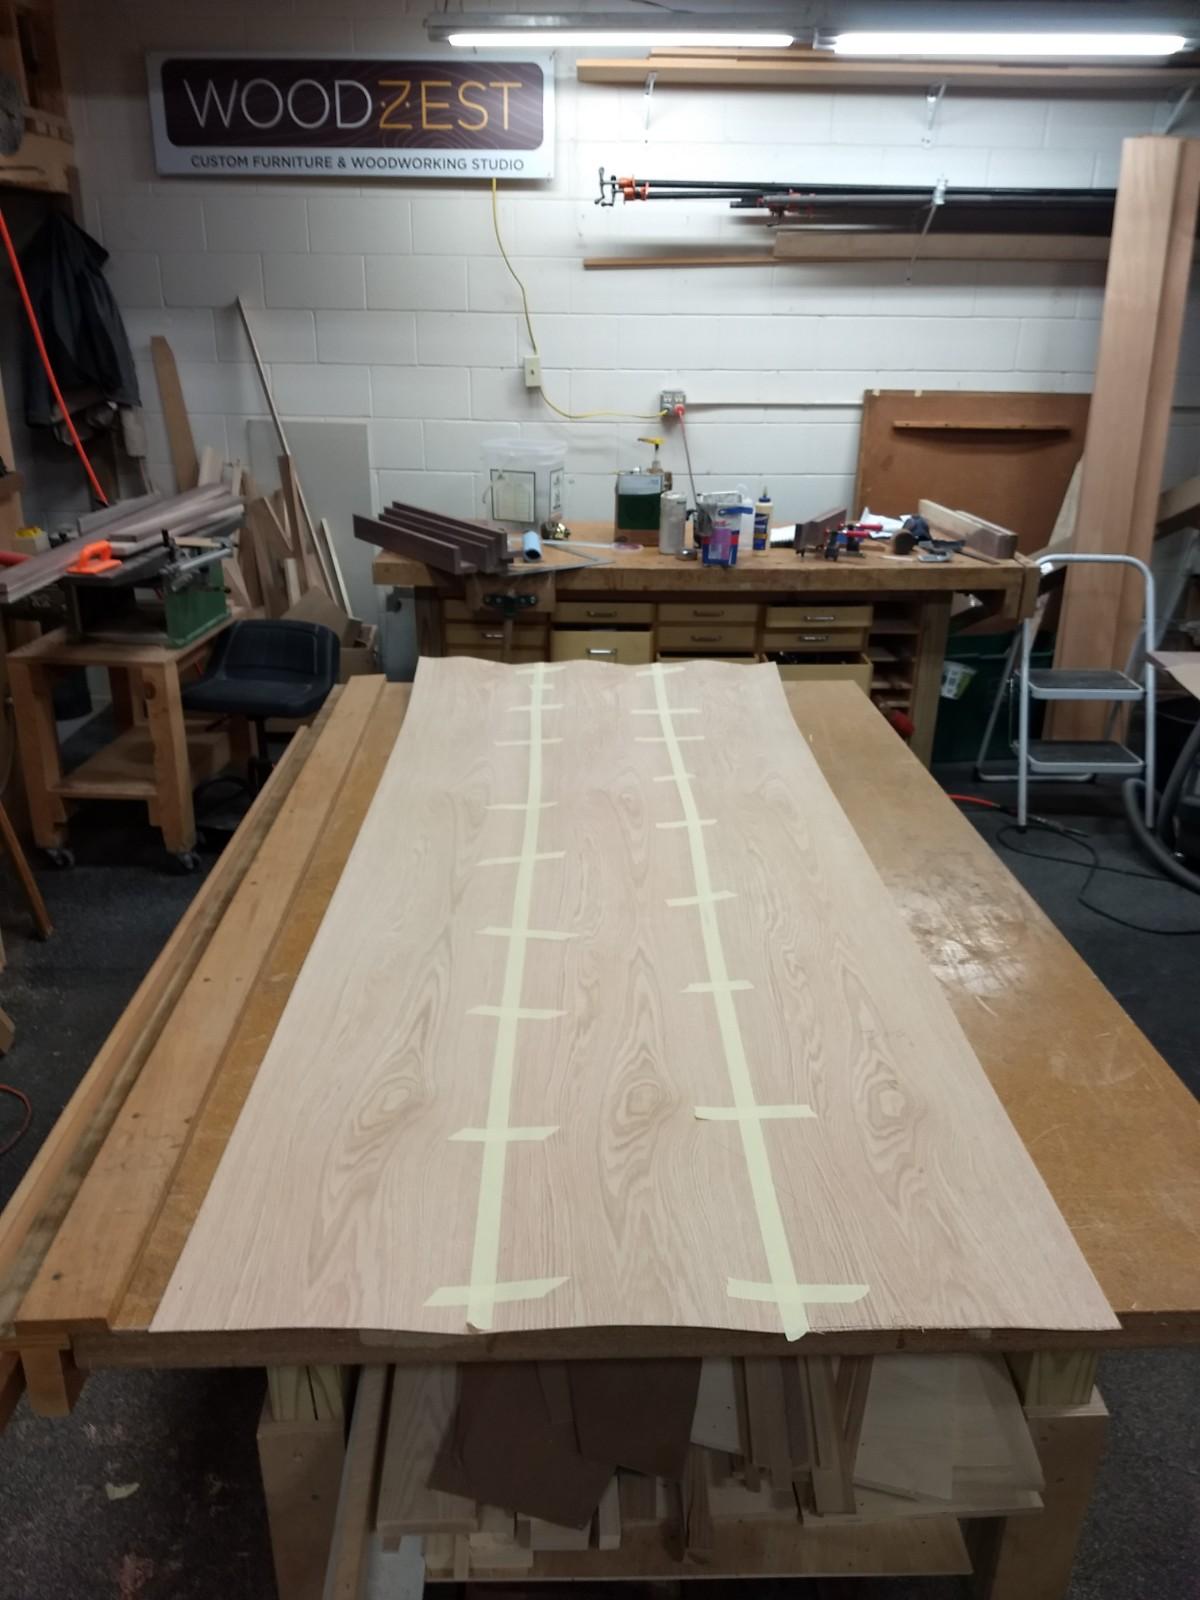 Taped together veneer